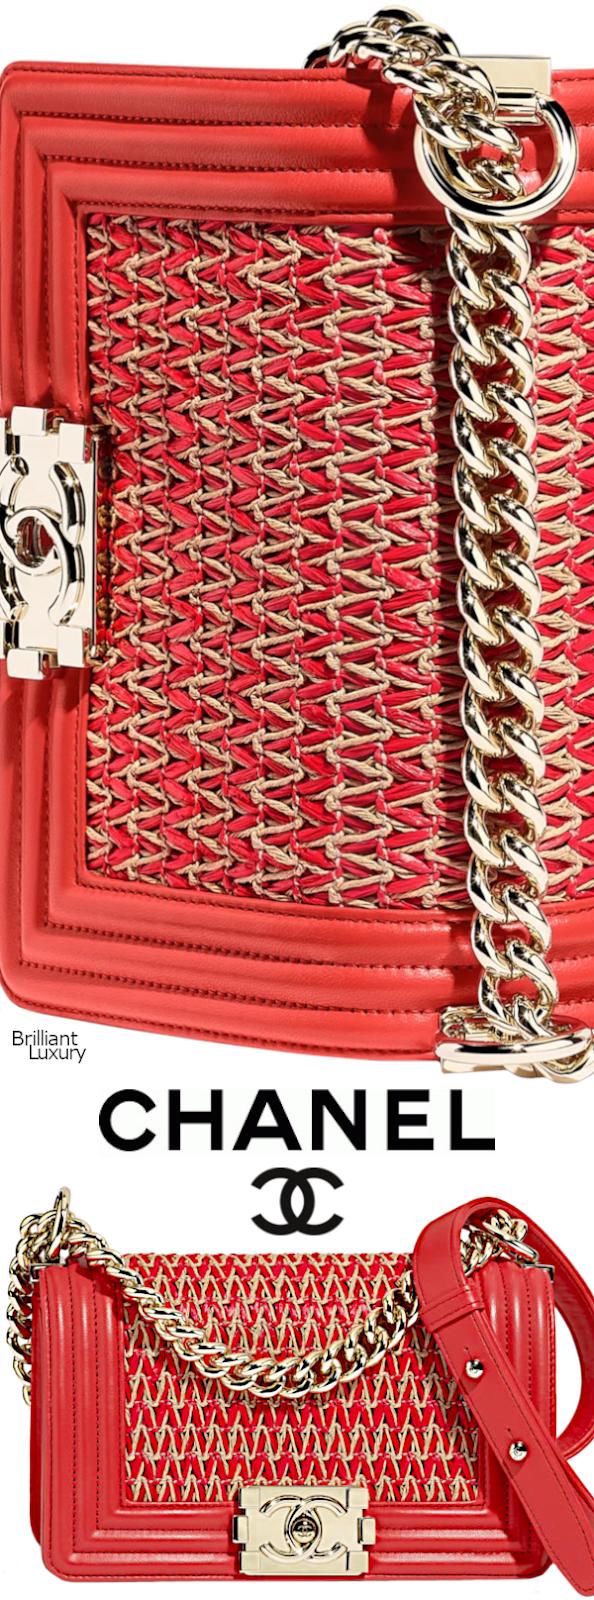 Brilliant Luxury♦Chanel Small Boy Handbag #red